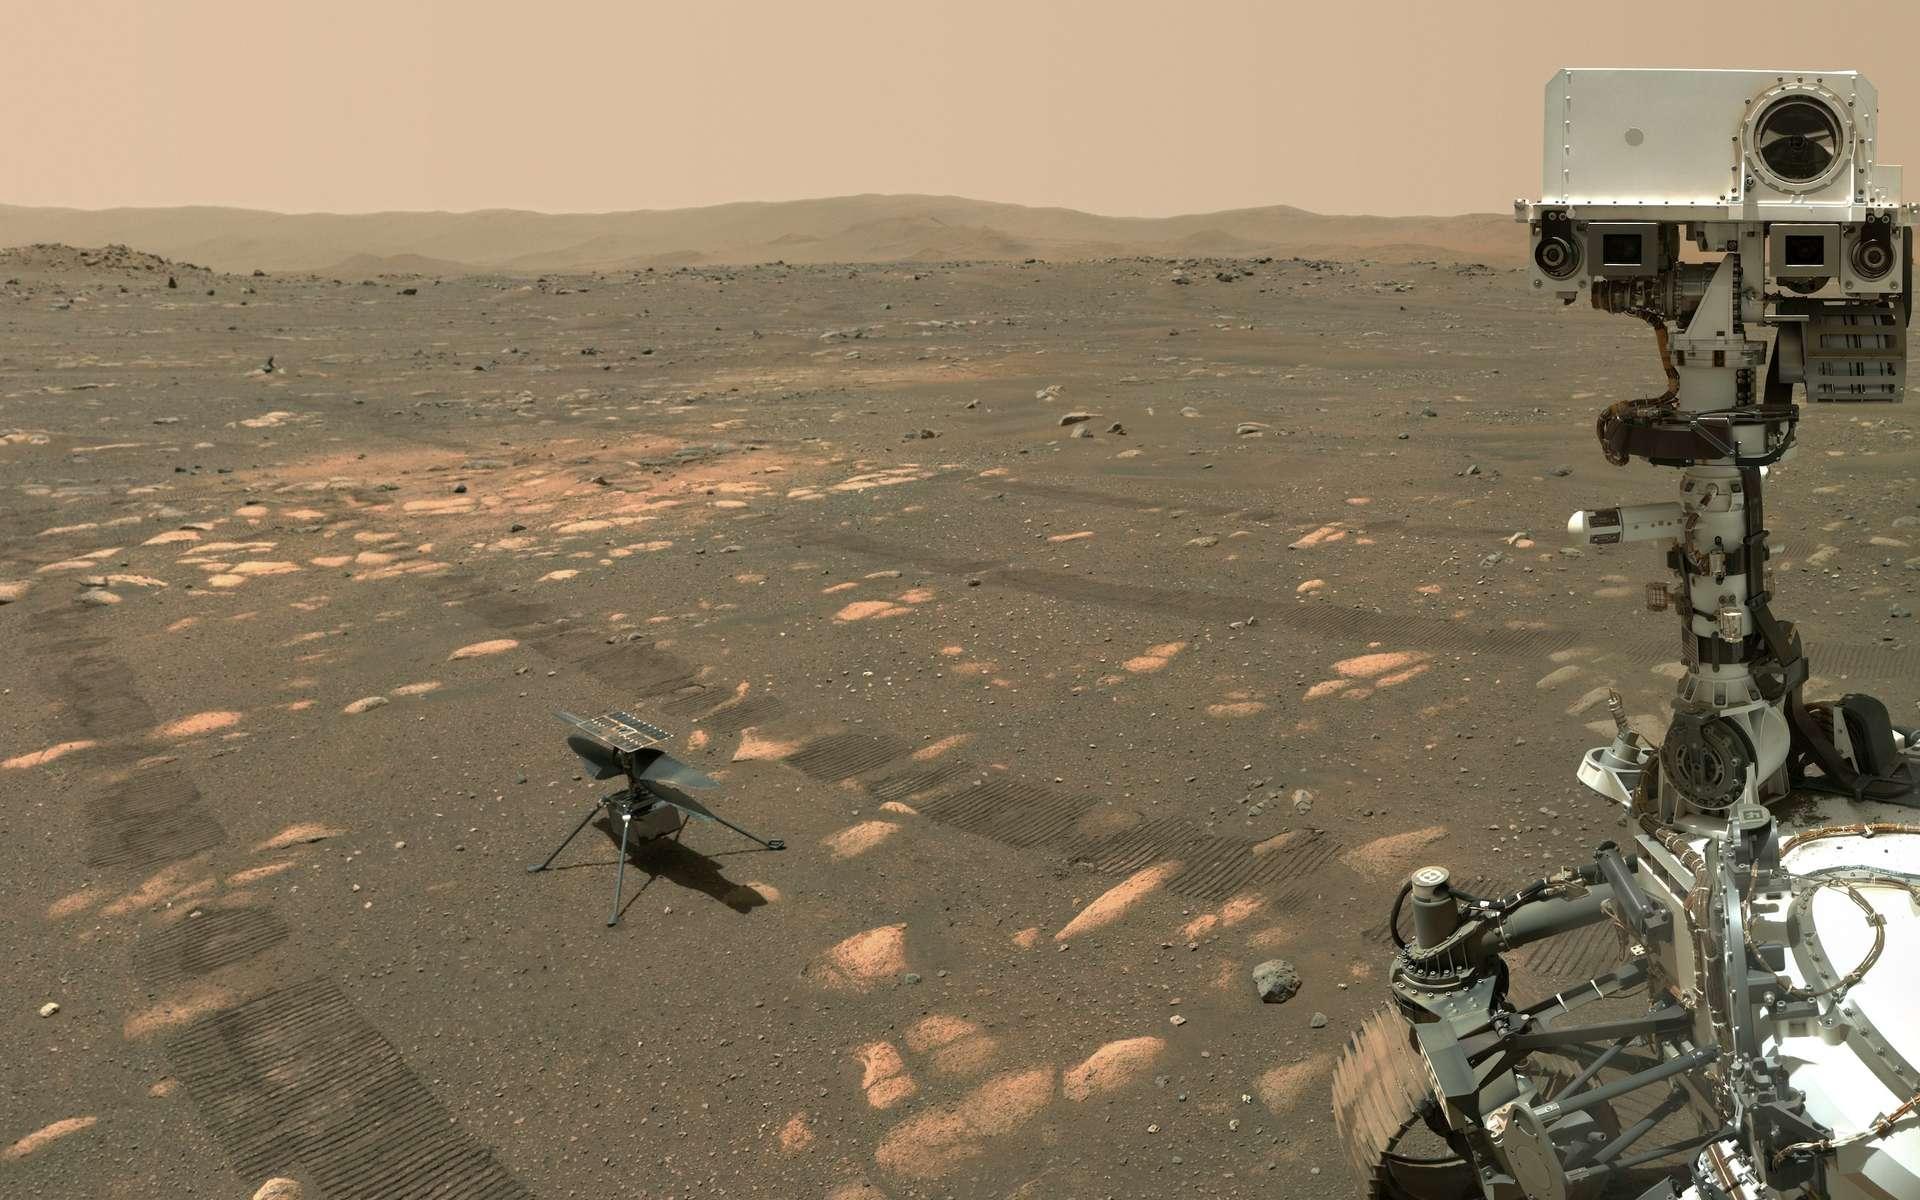 Perseverance pose à 3,9 mètres d'Ingenuity. © Nasa, JPL-Caltech, MSSS